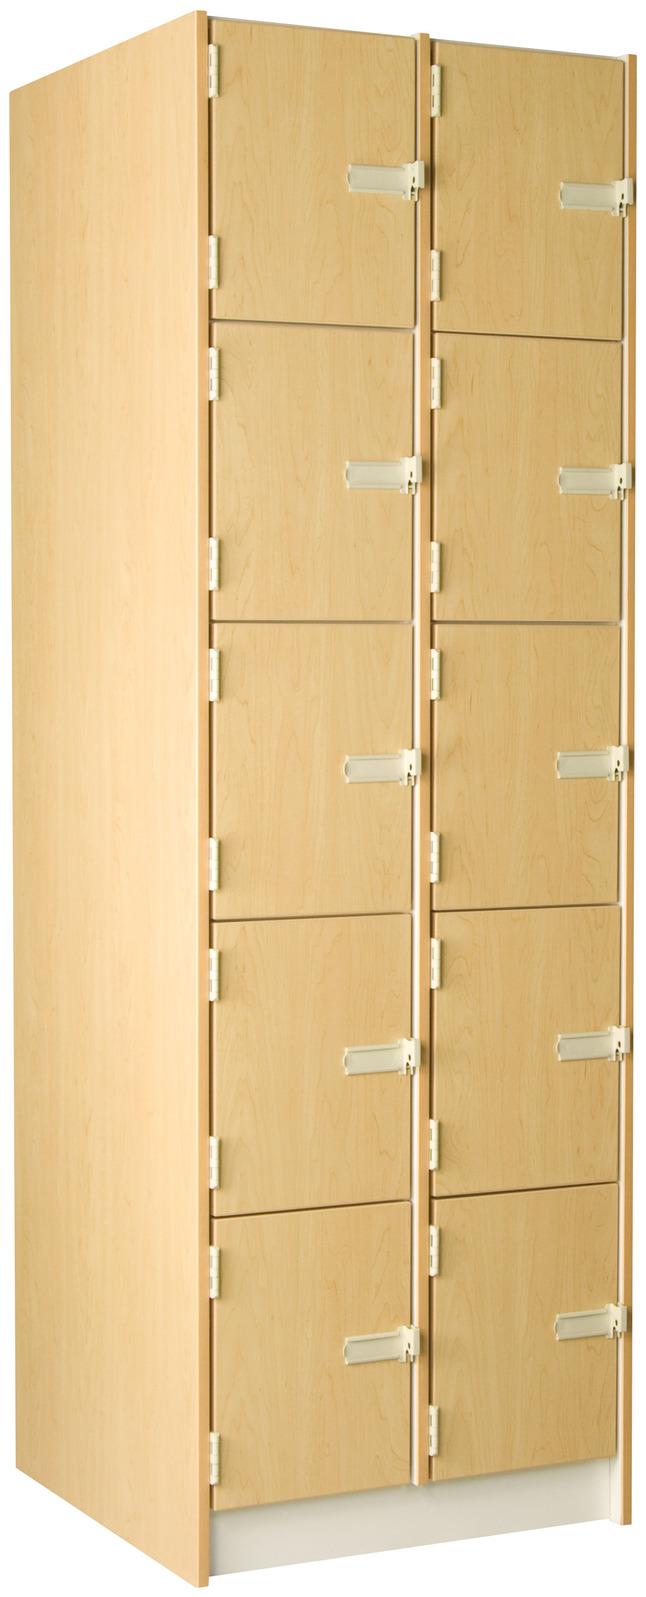 Instrument Storage, Item Number 1367394